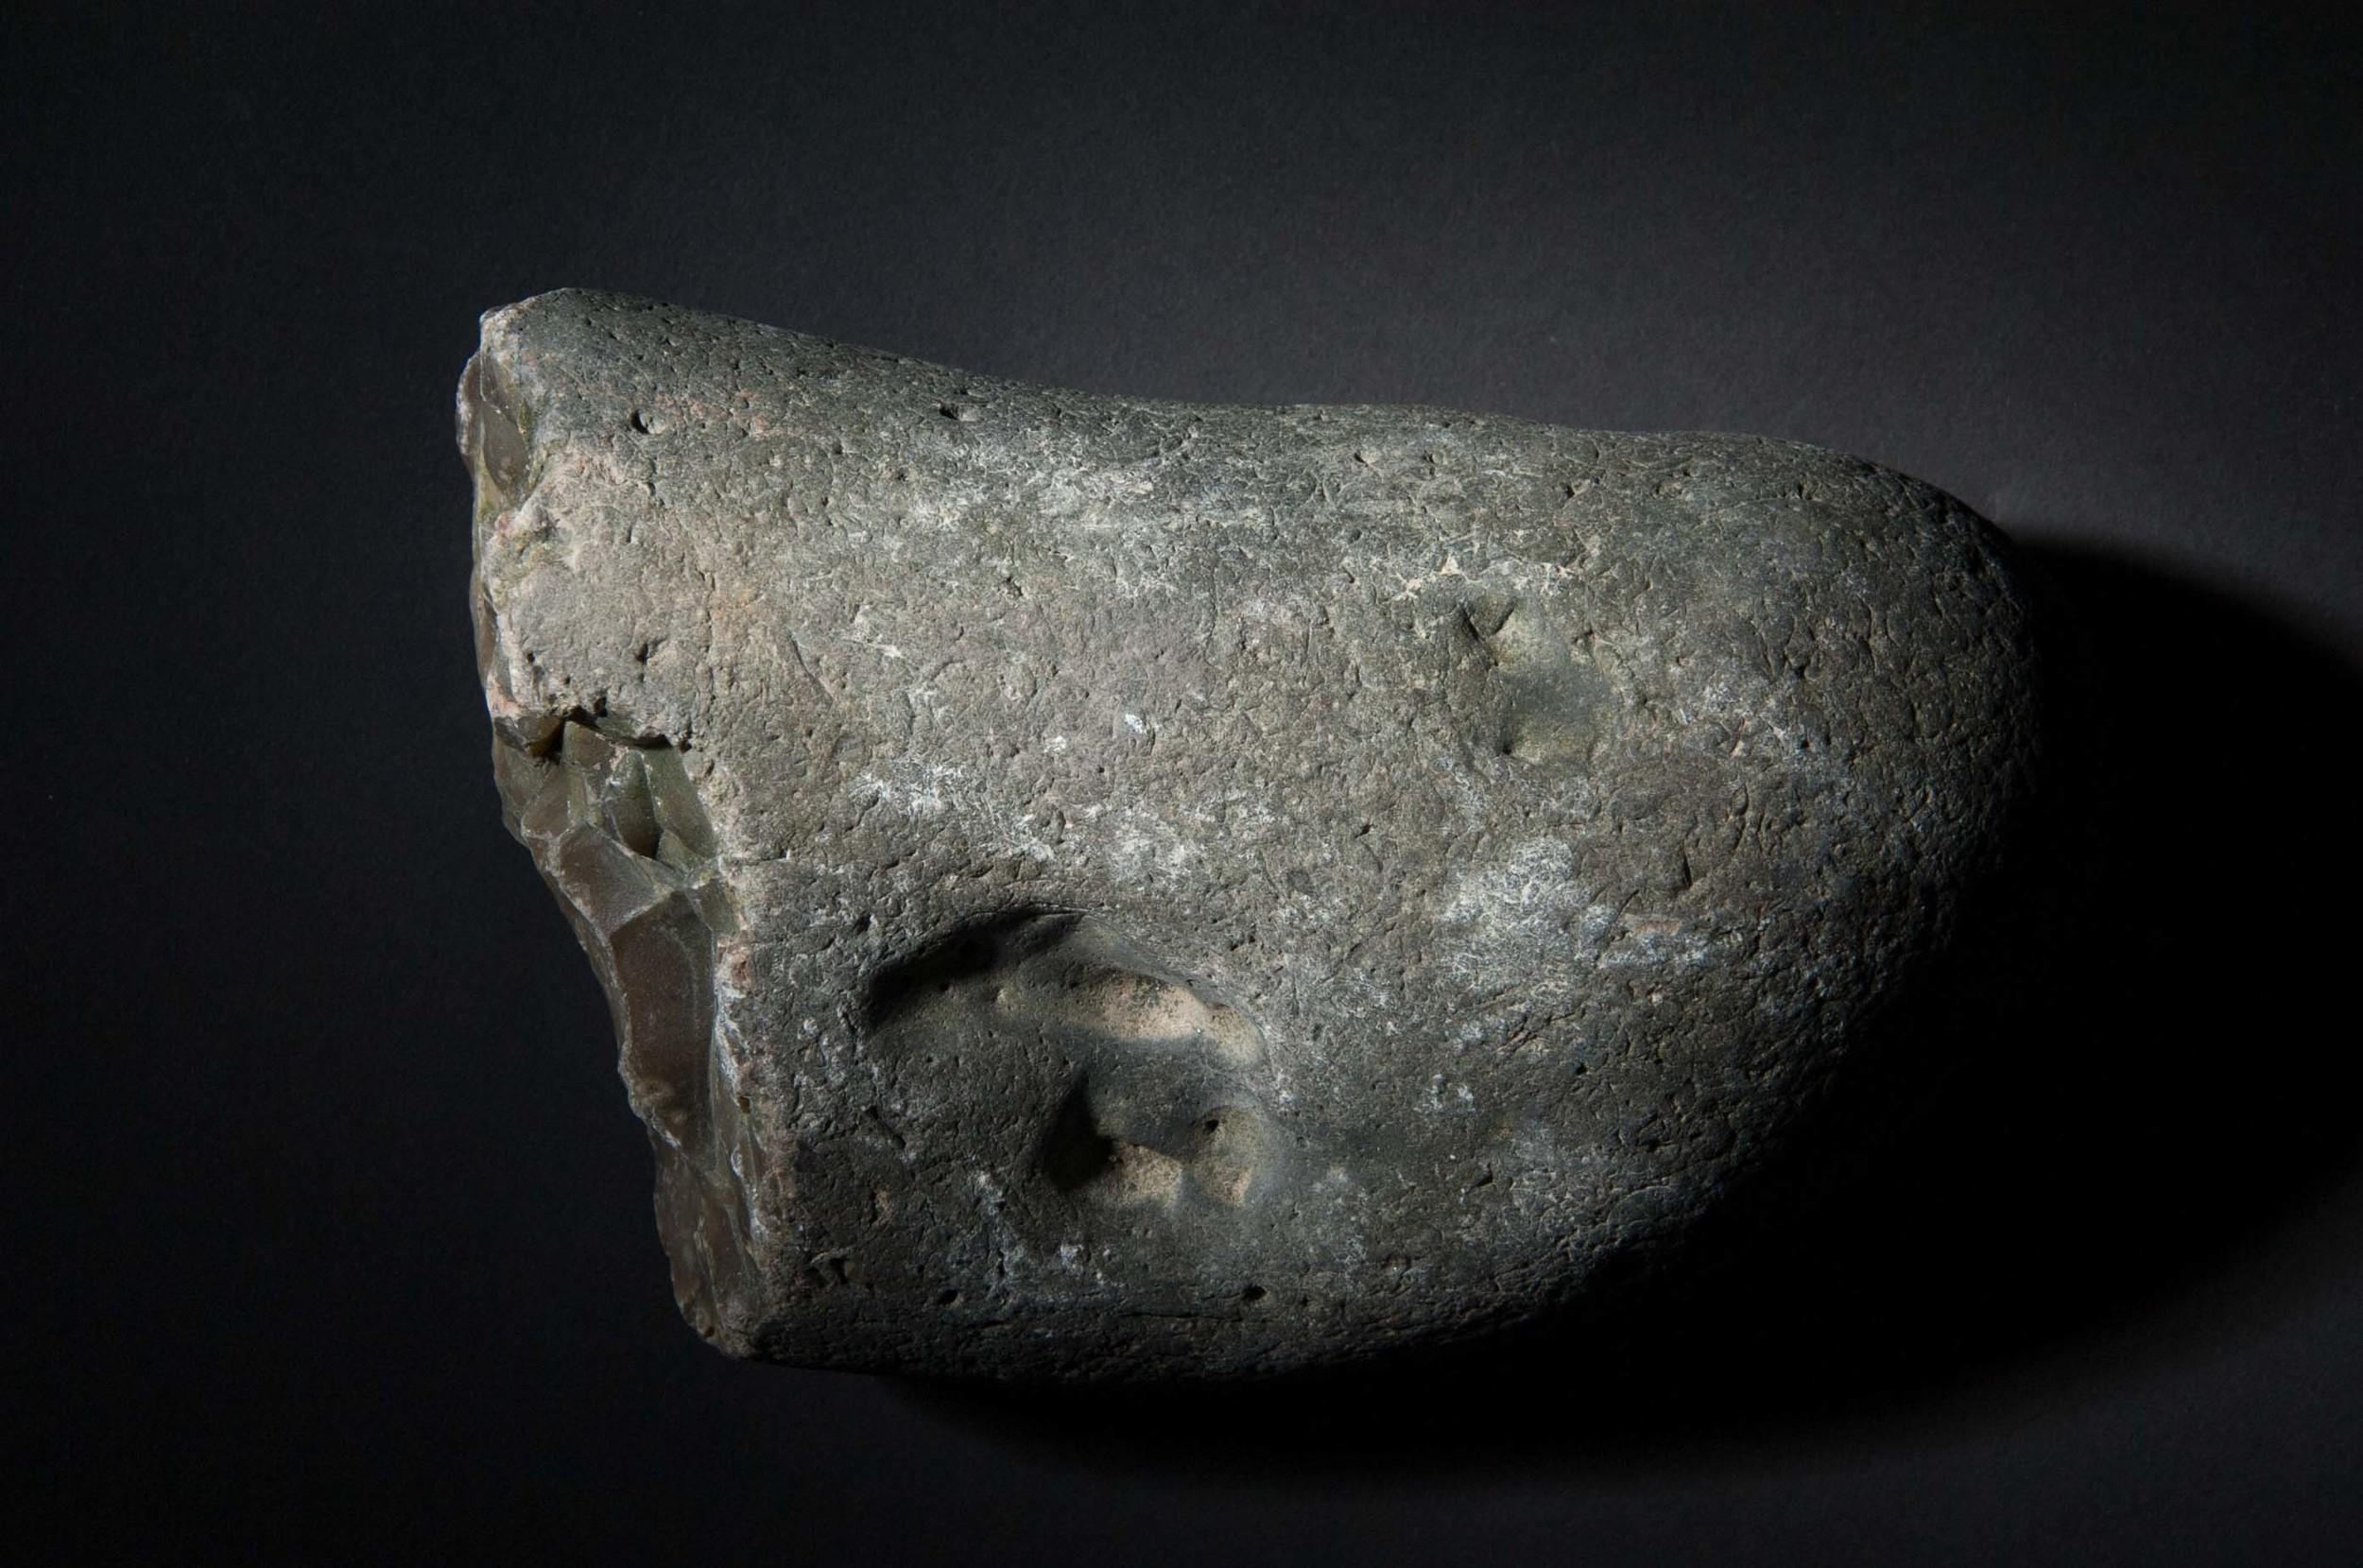 Tiny Rocks-9.jpg